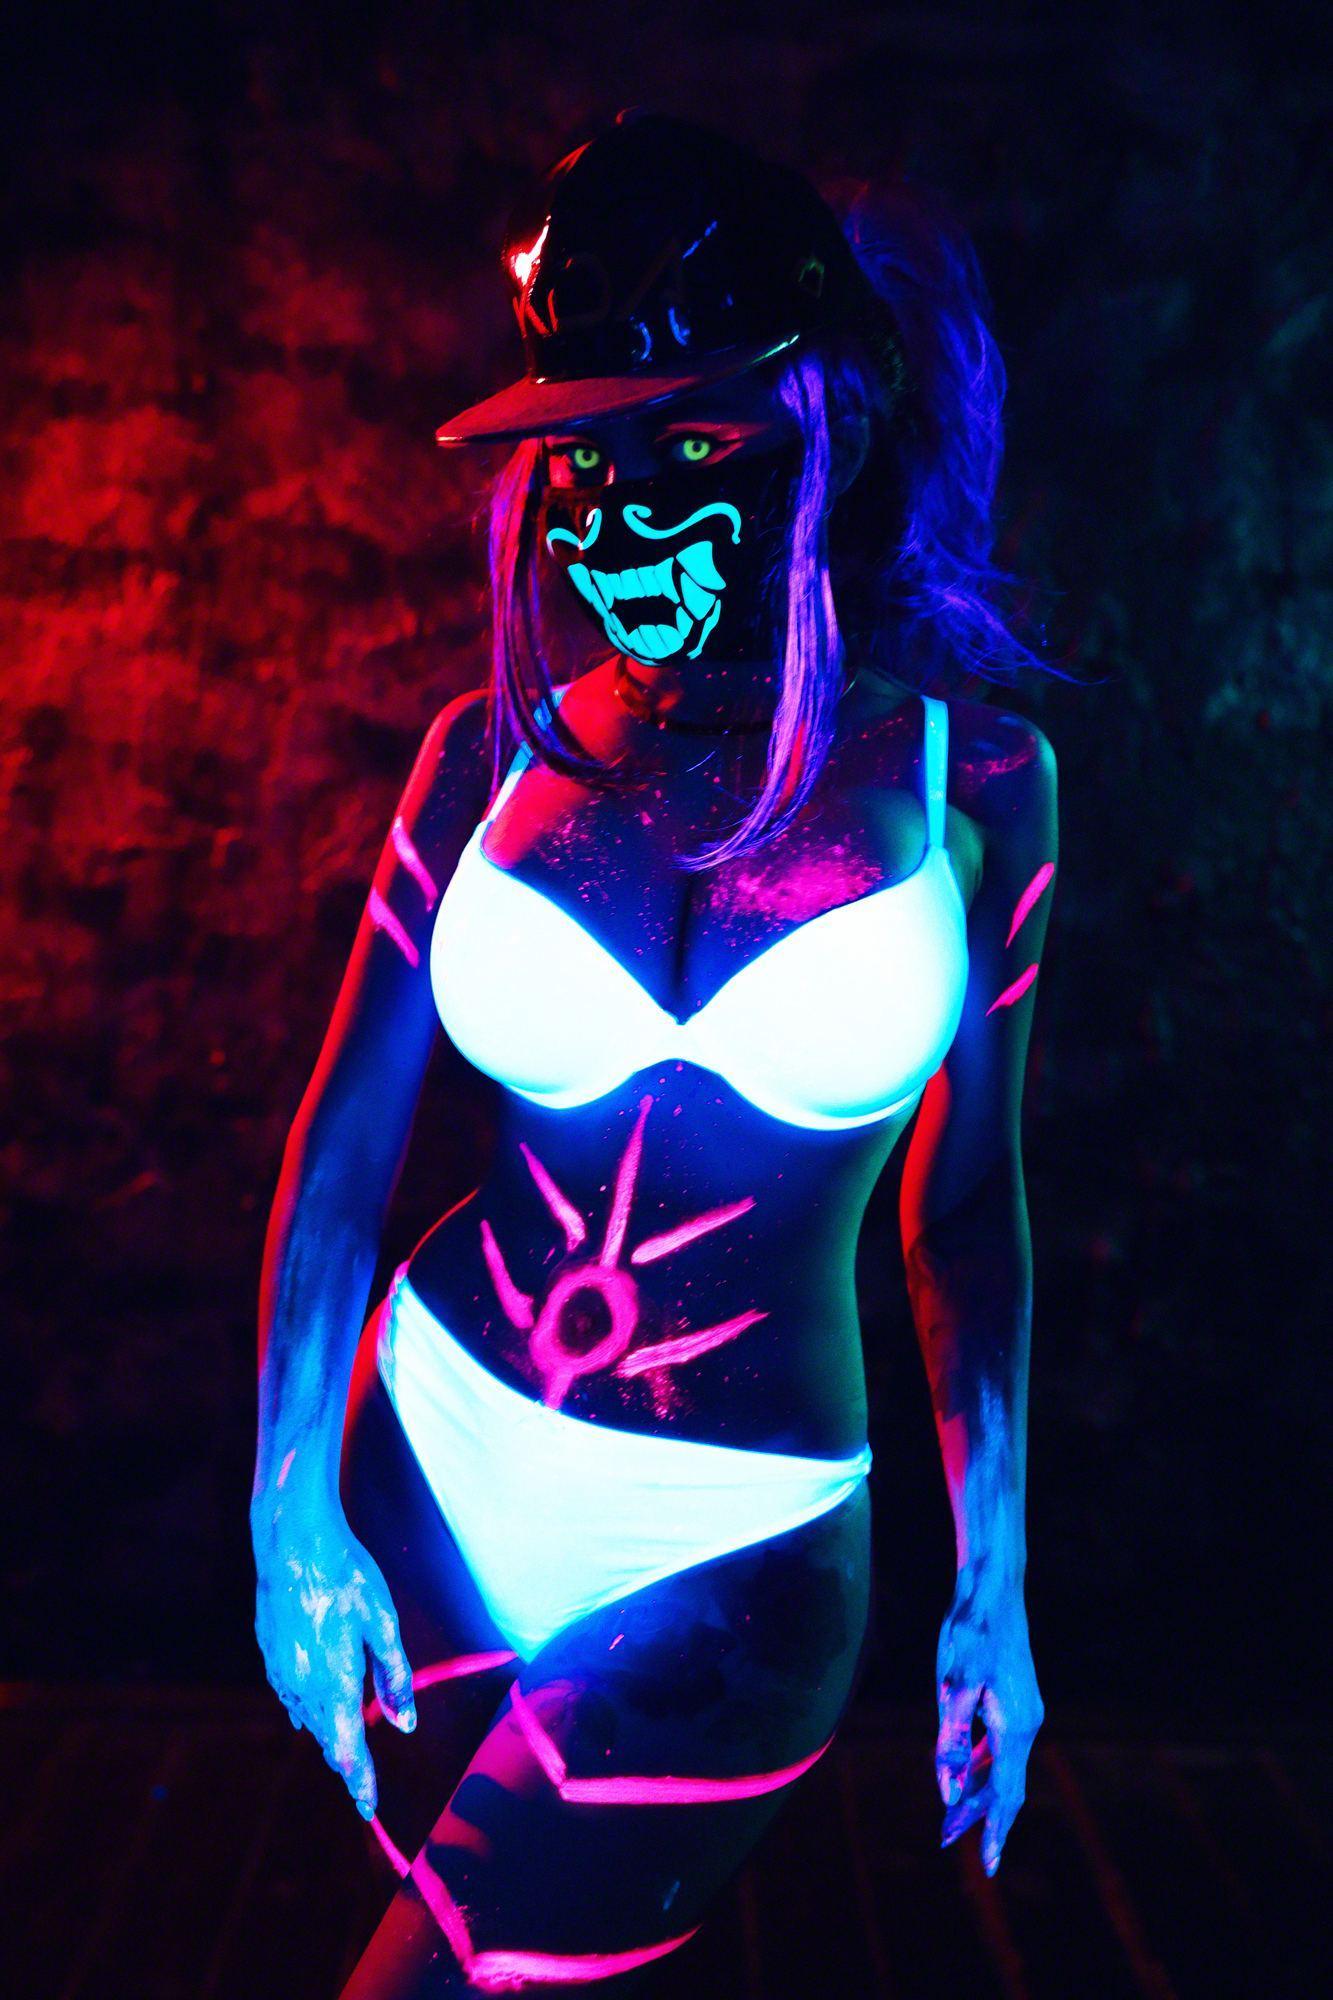 Kalinka Fox Nude Akali Cosplay Leaked 5